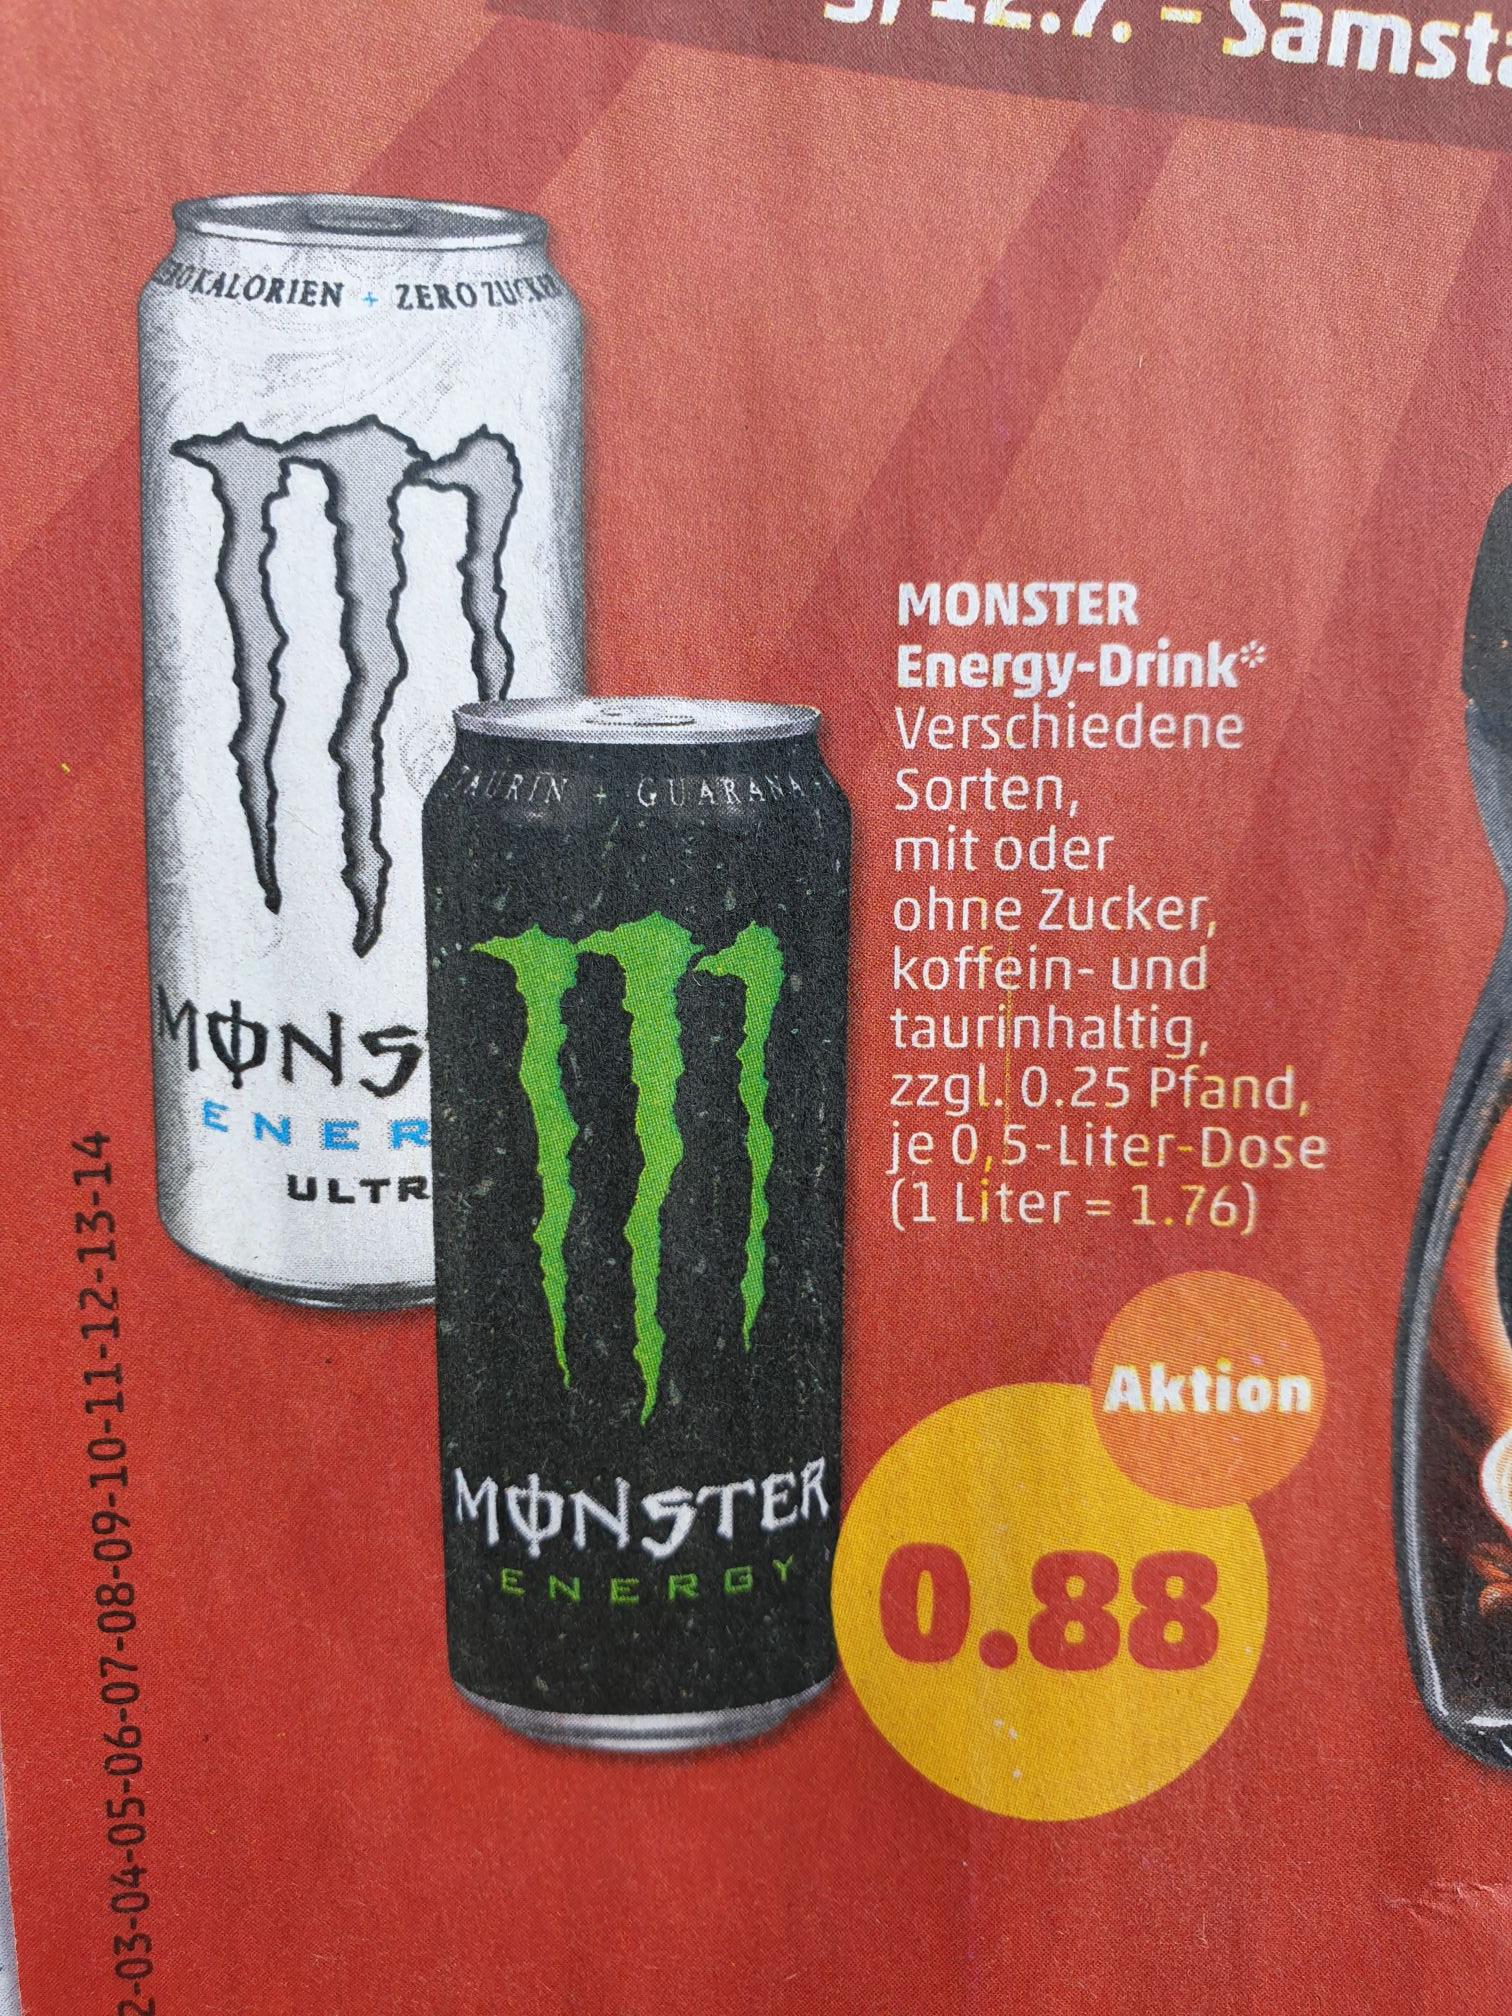 [Penny] Ab 12.7 Monster Energy Drink für je 0.88€